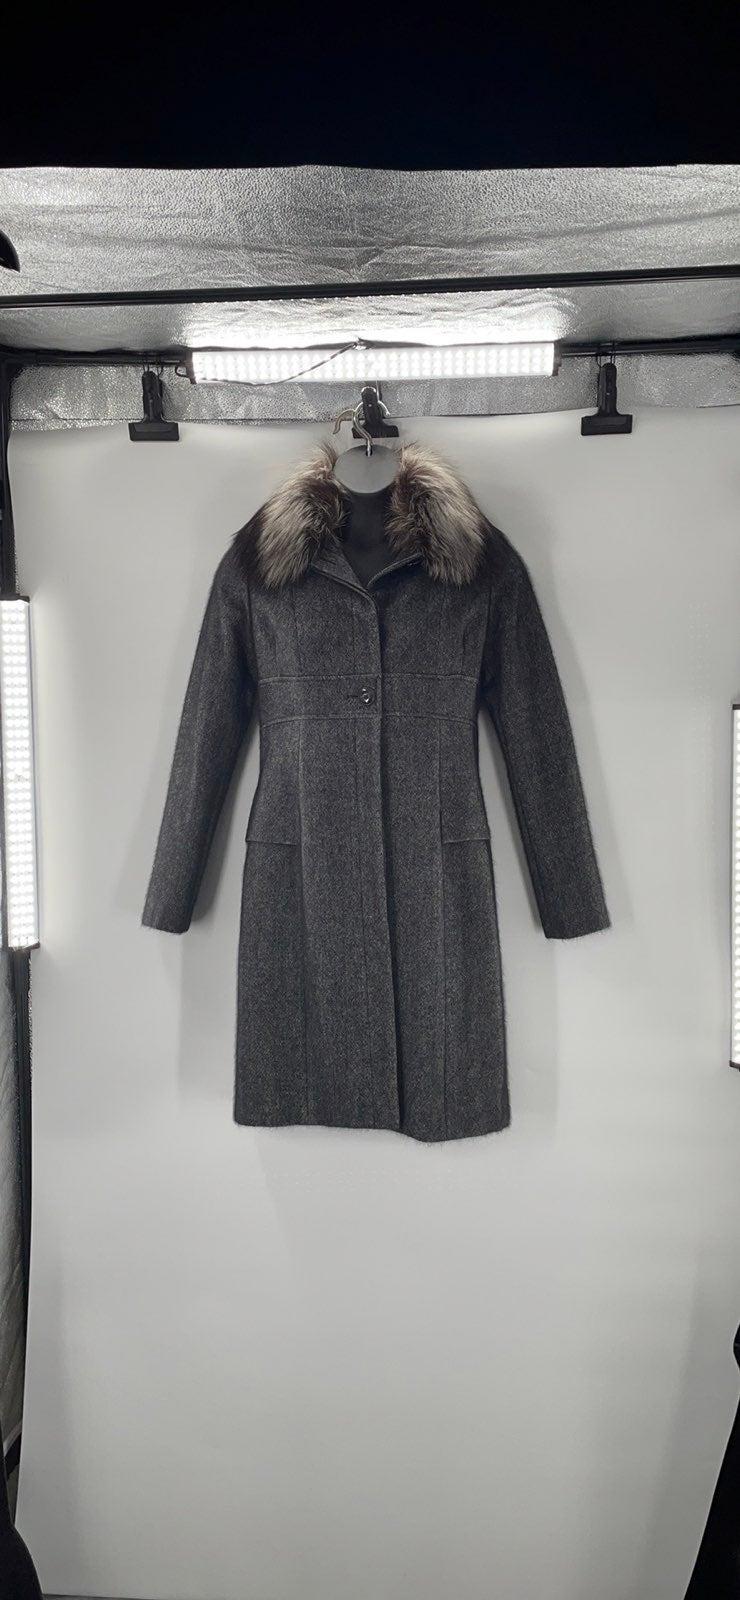 Christian Dior Fur Trim Pea Coat